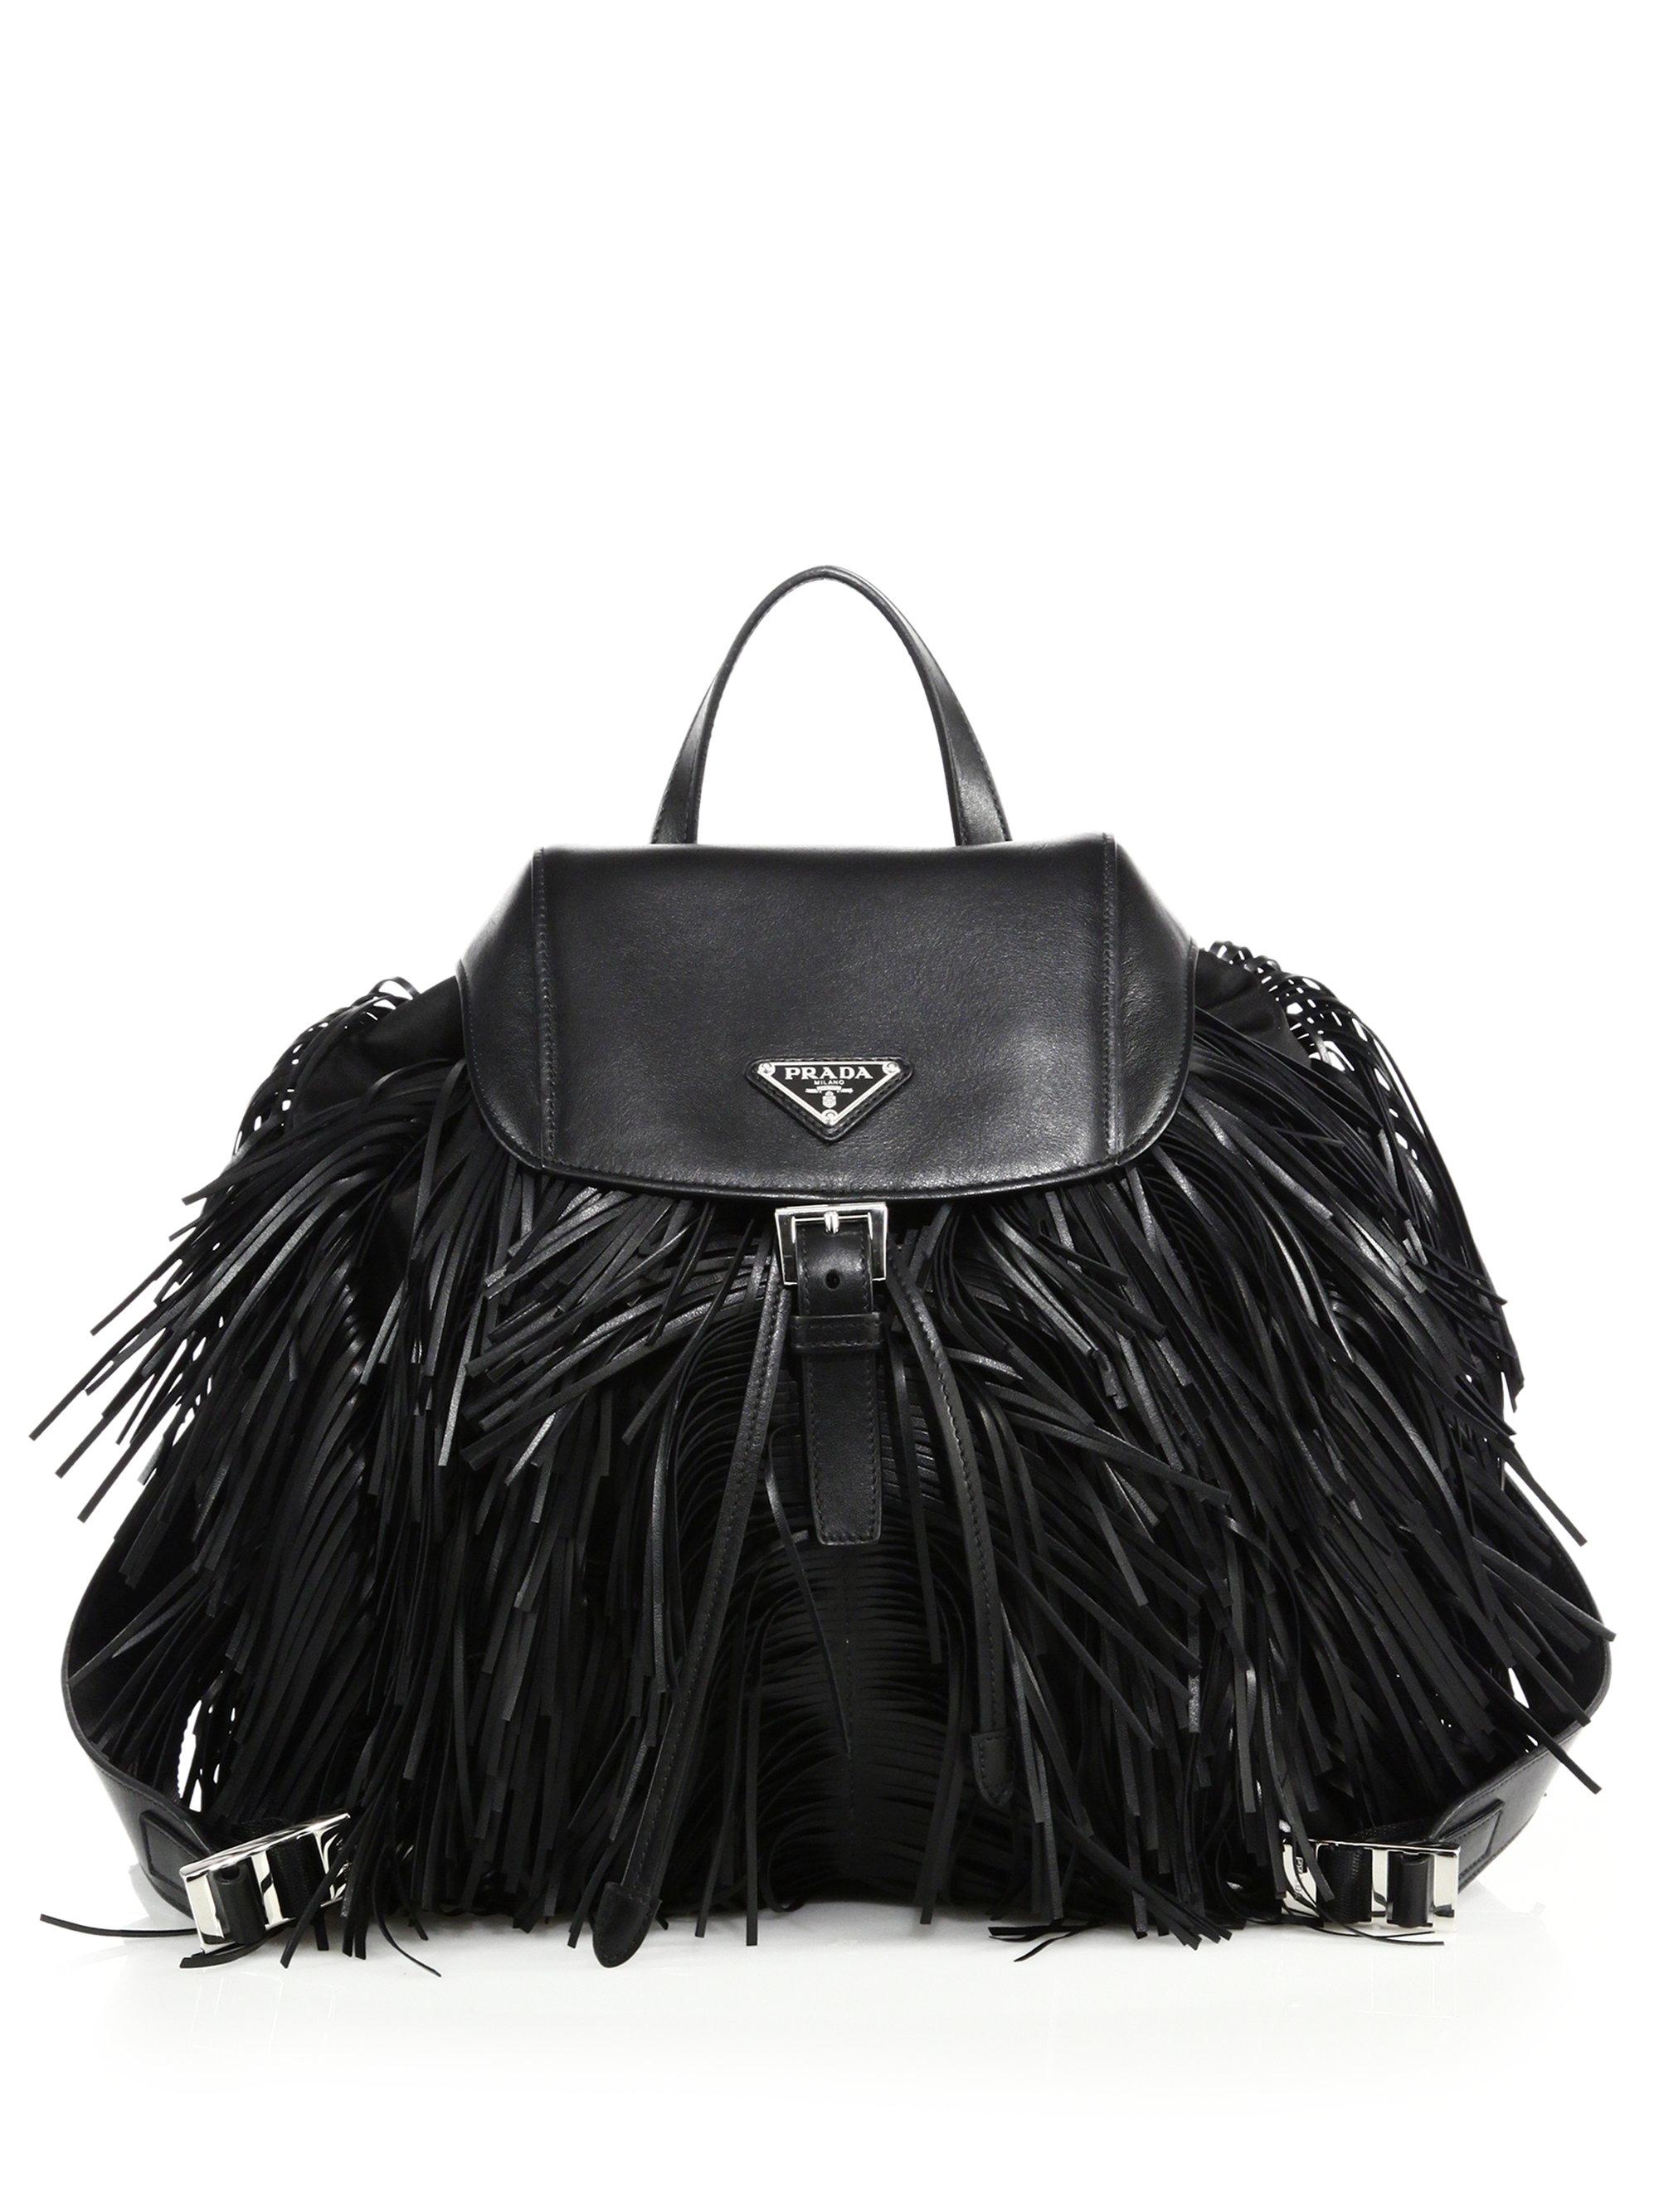 prada nylon tote black - Prada Fringed Nylon \u0026amp; Leather Backpack in Black | Lyst